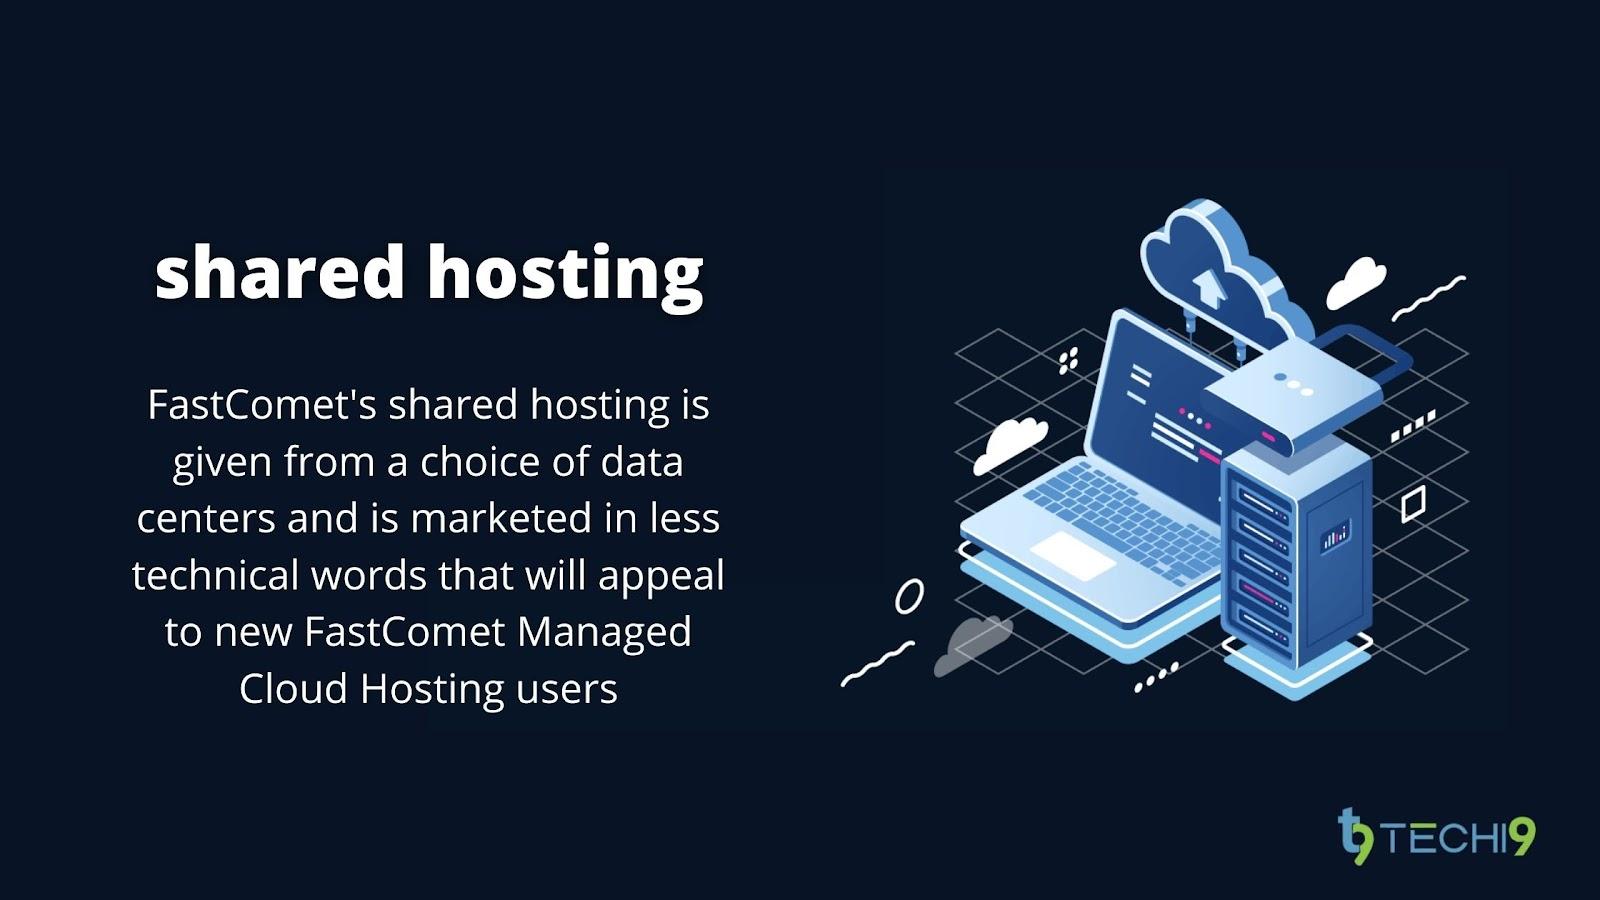 FastComet Shared Hosting